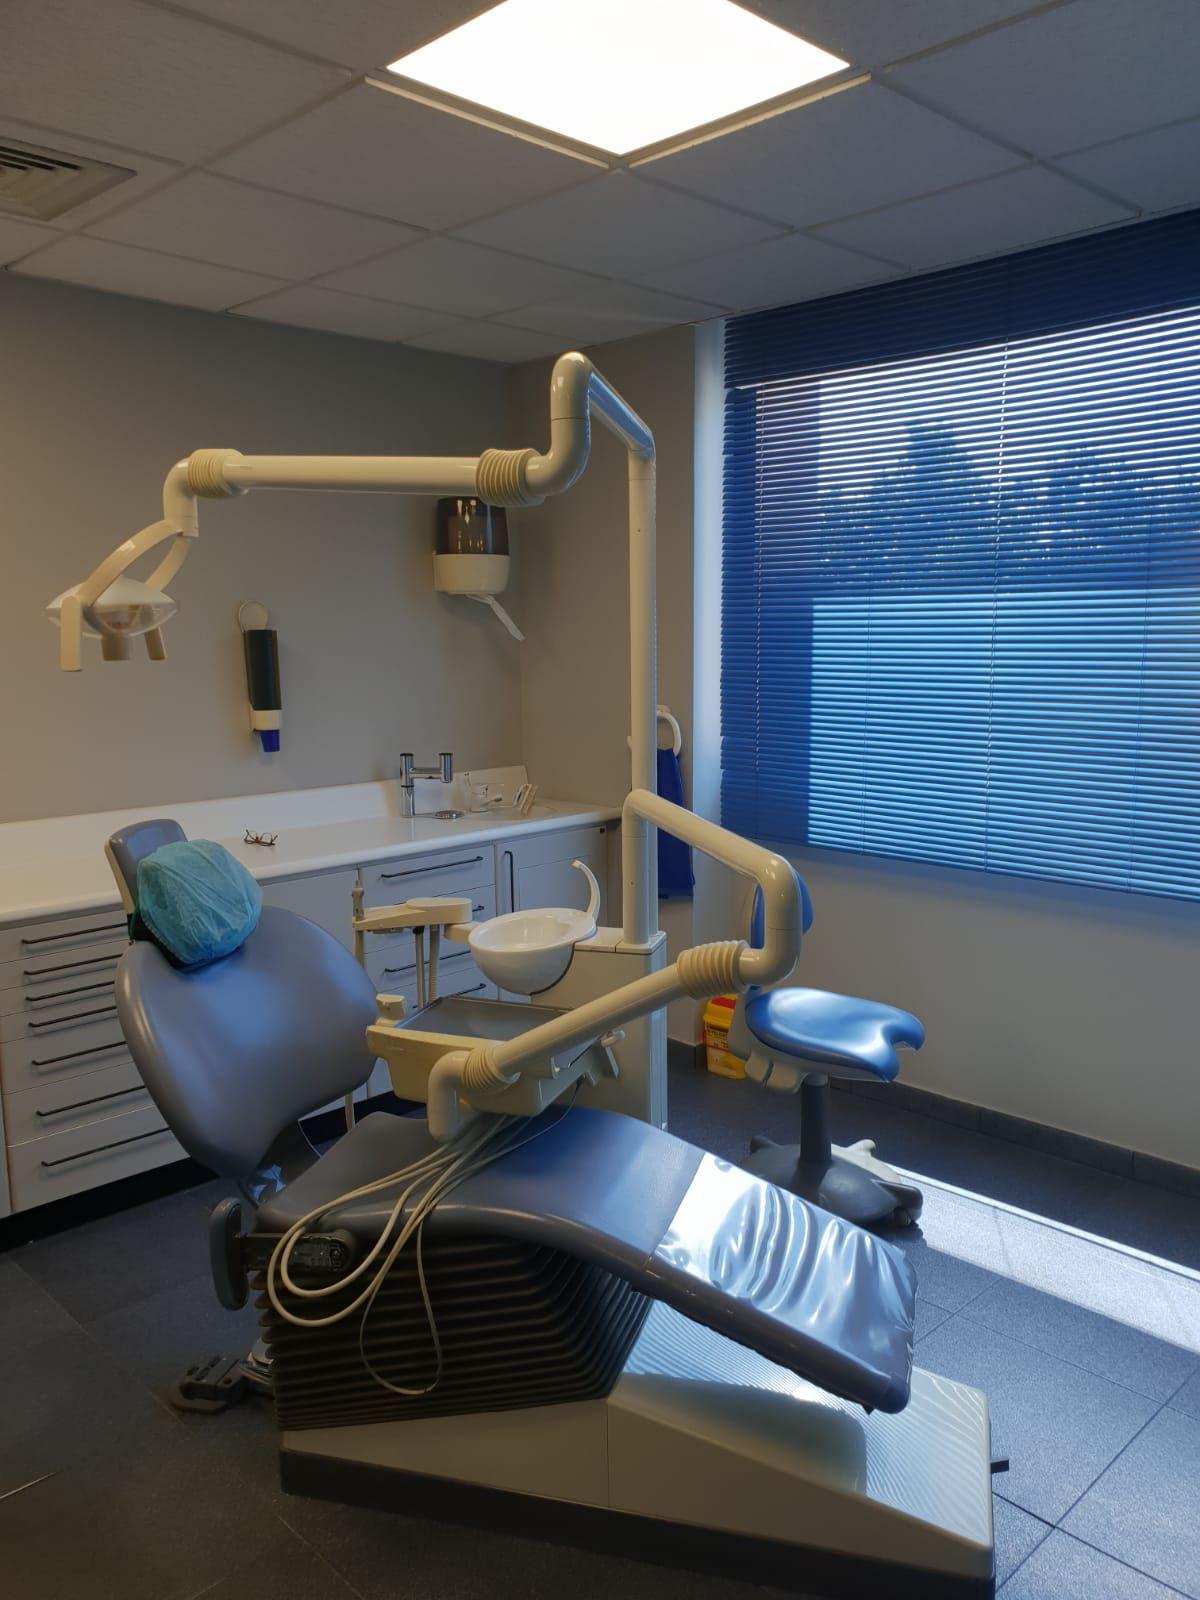 Prótesis dentales en Cornella de Llobregat